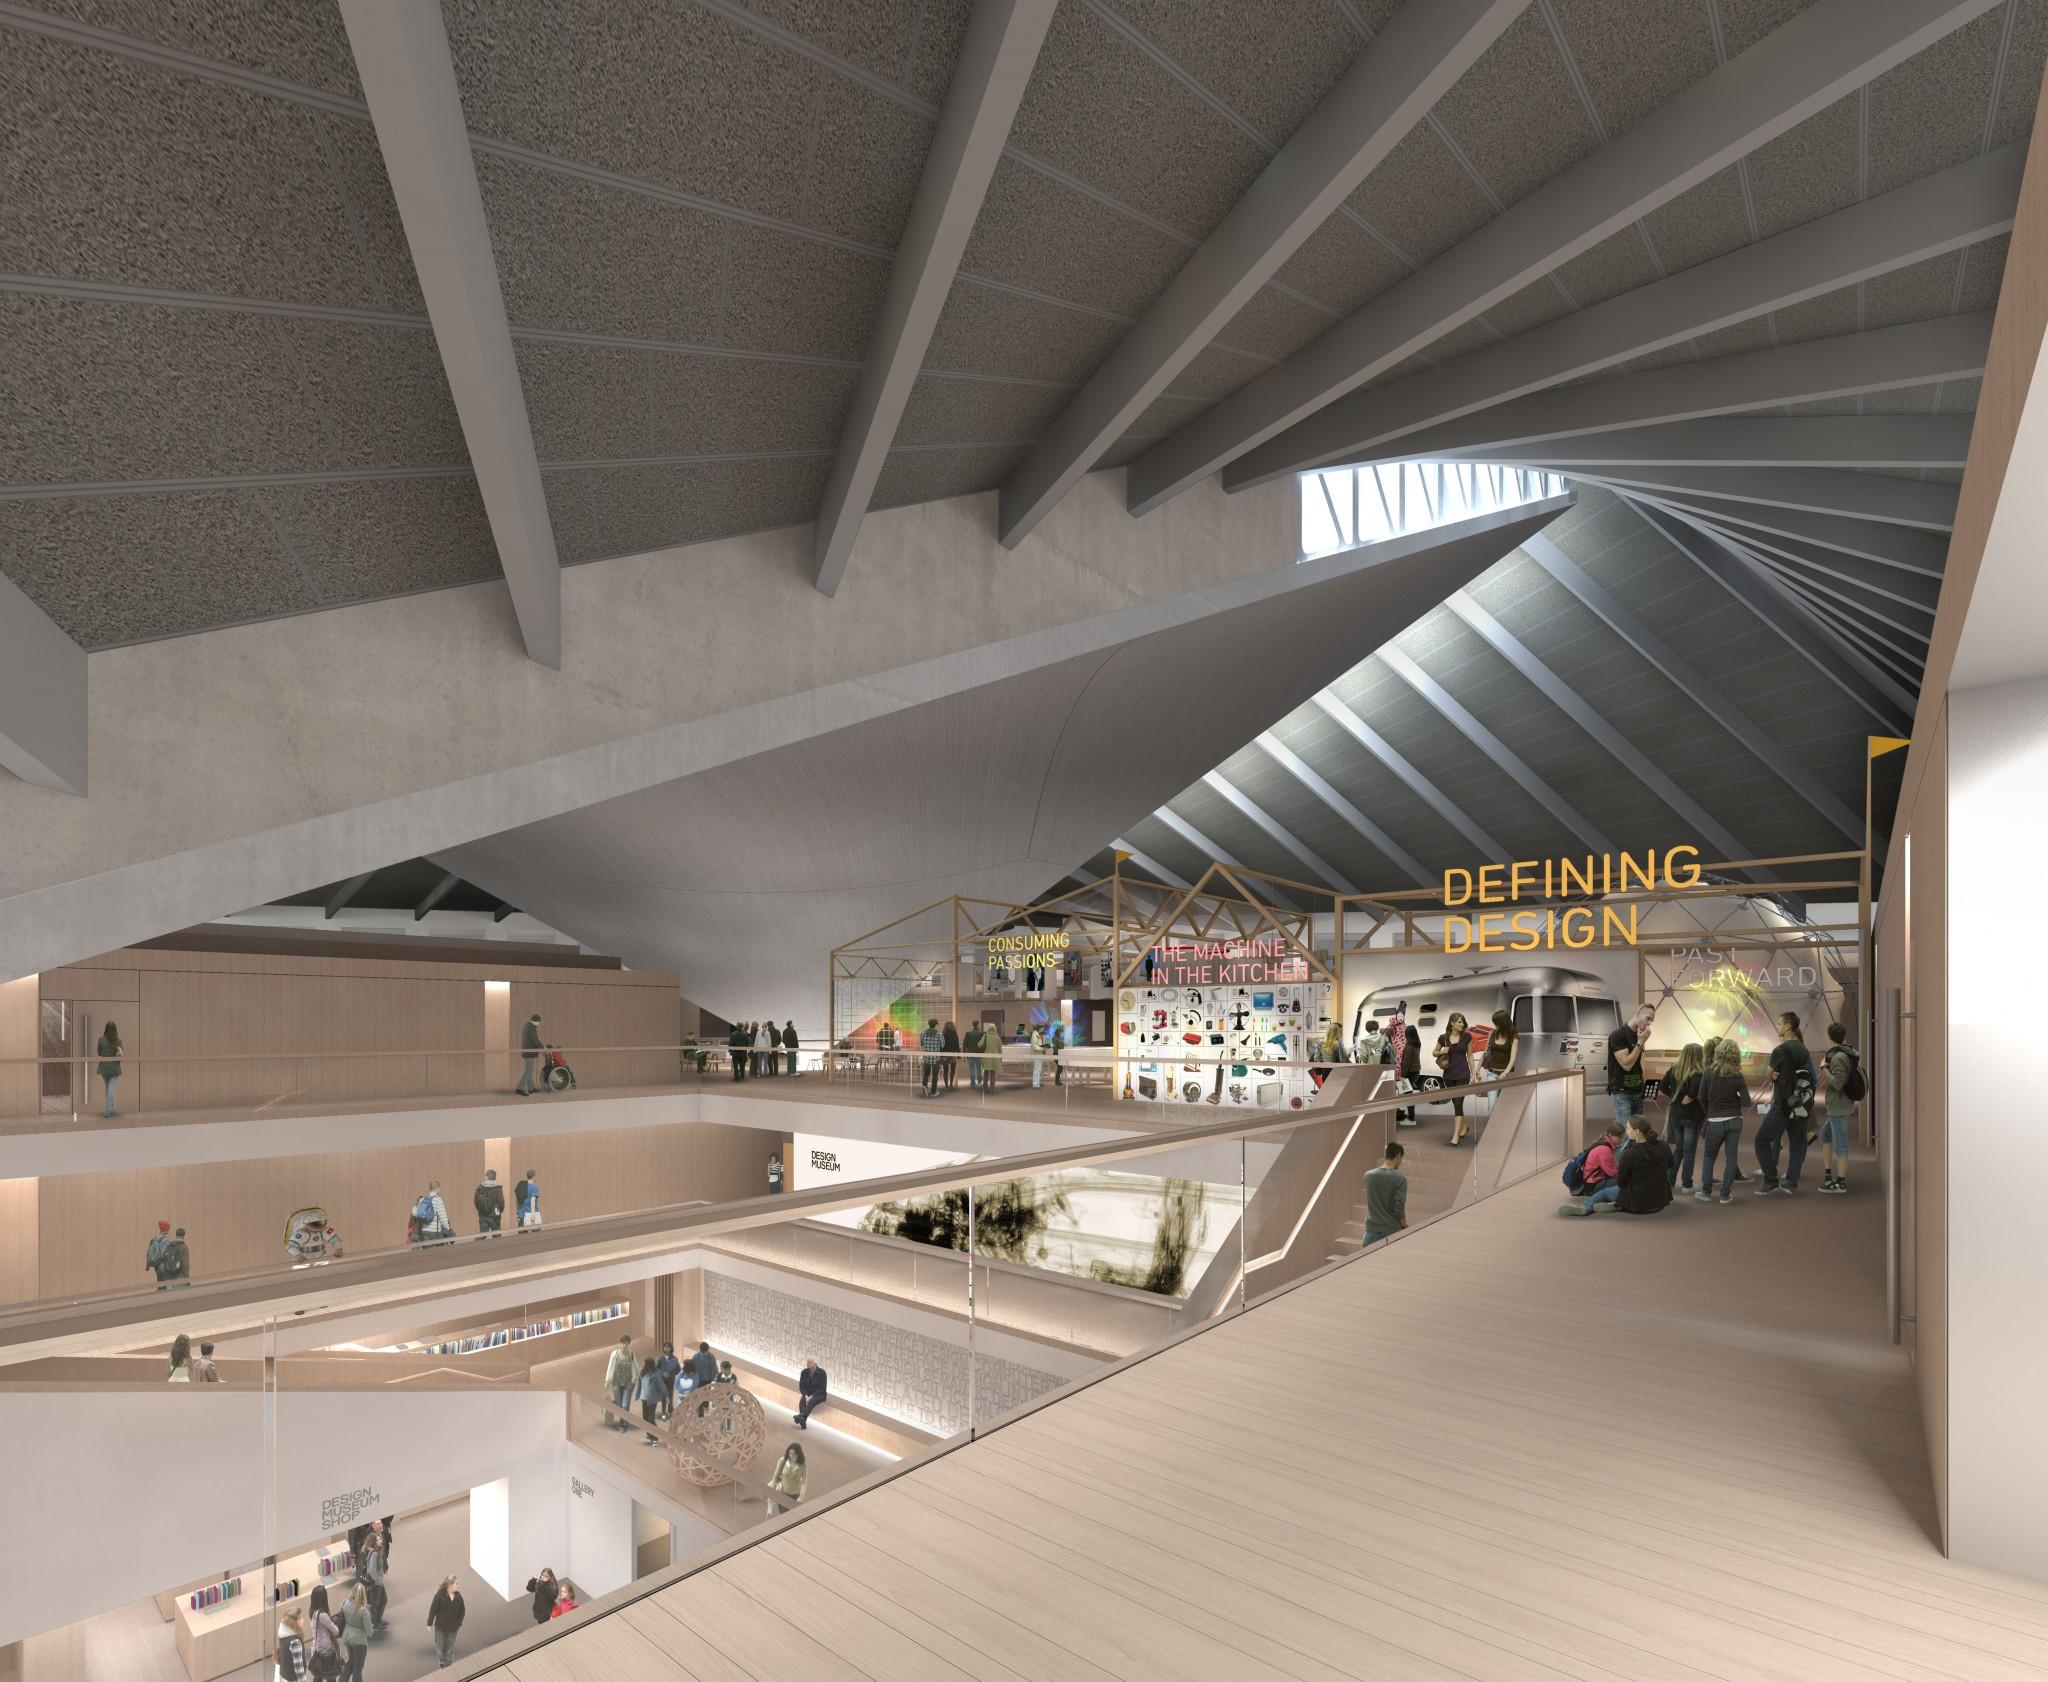 Design-Museum-Kensington-render-Top-Floor-Permanent-Exhibition-credit-Alex-Morris-Visualisation.